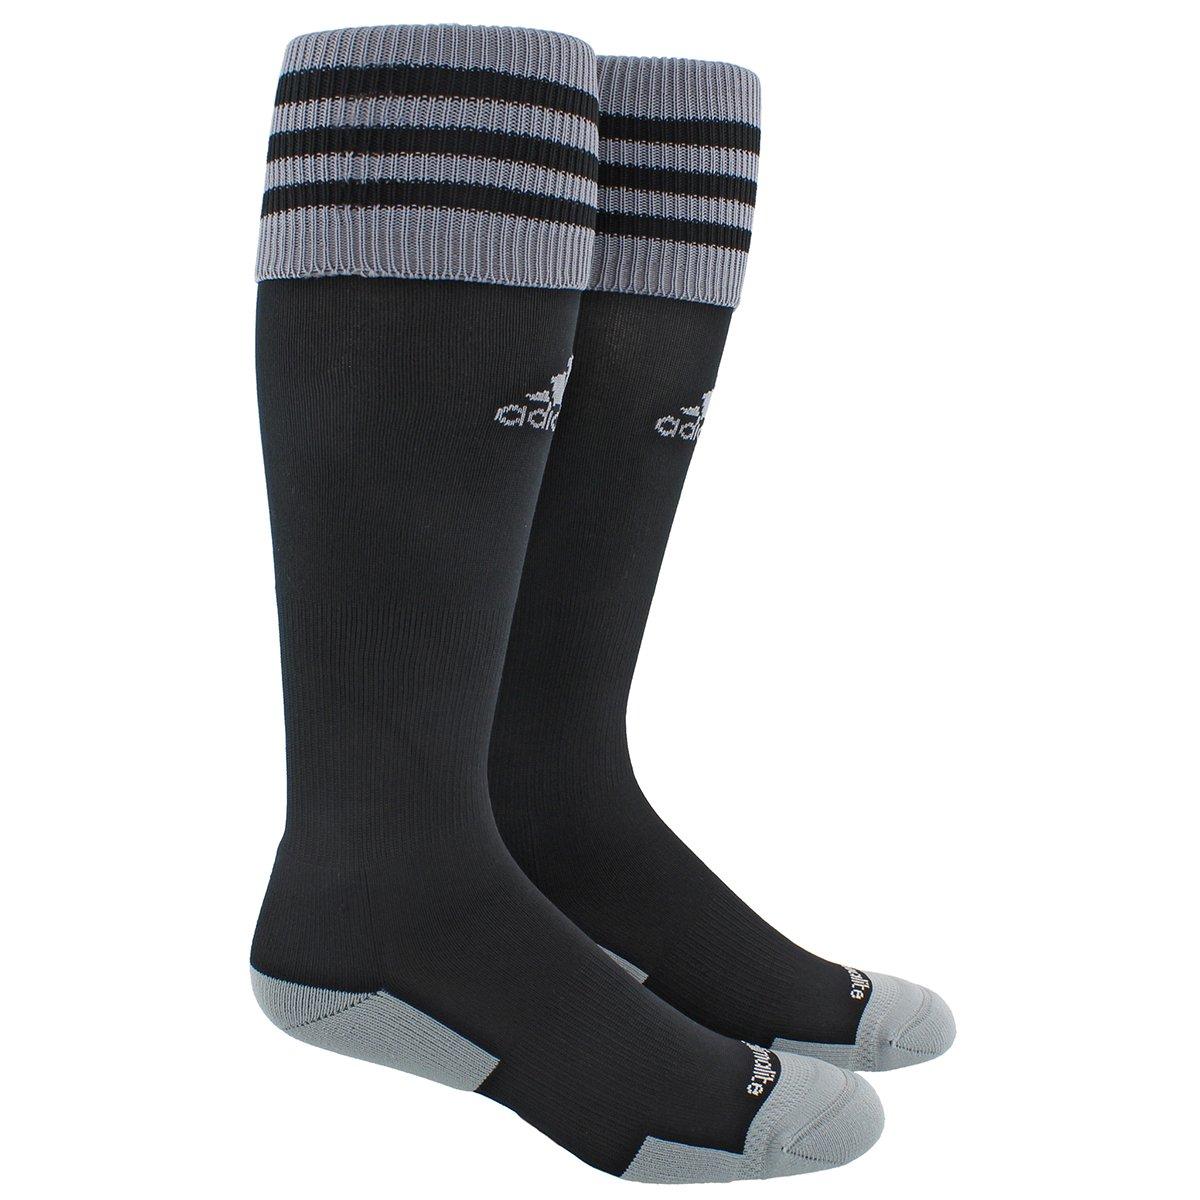 44577f502 Amazon.com : adidas Copa Zone Cushion Ii Soccer Socks, Black/Grey, Small :  Sports & Outdoors